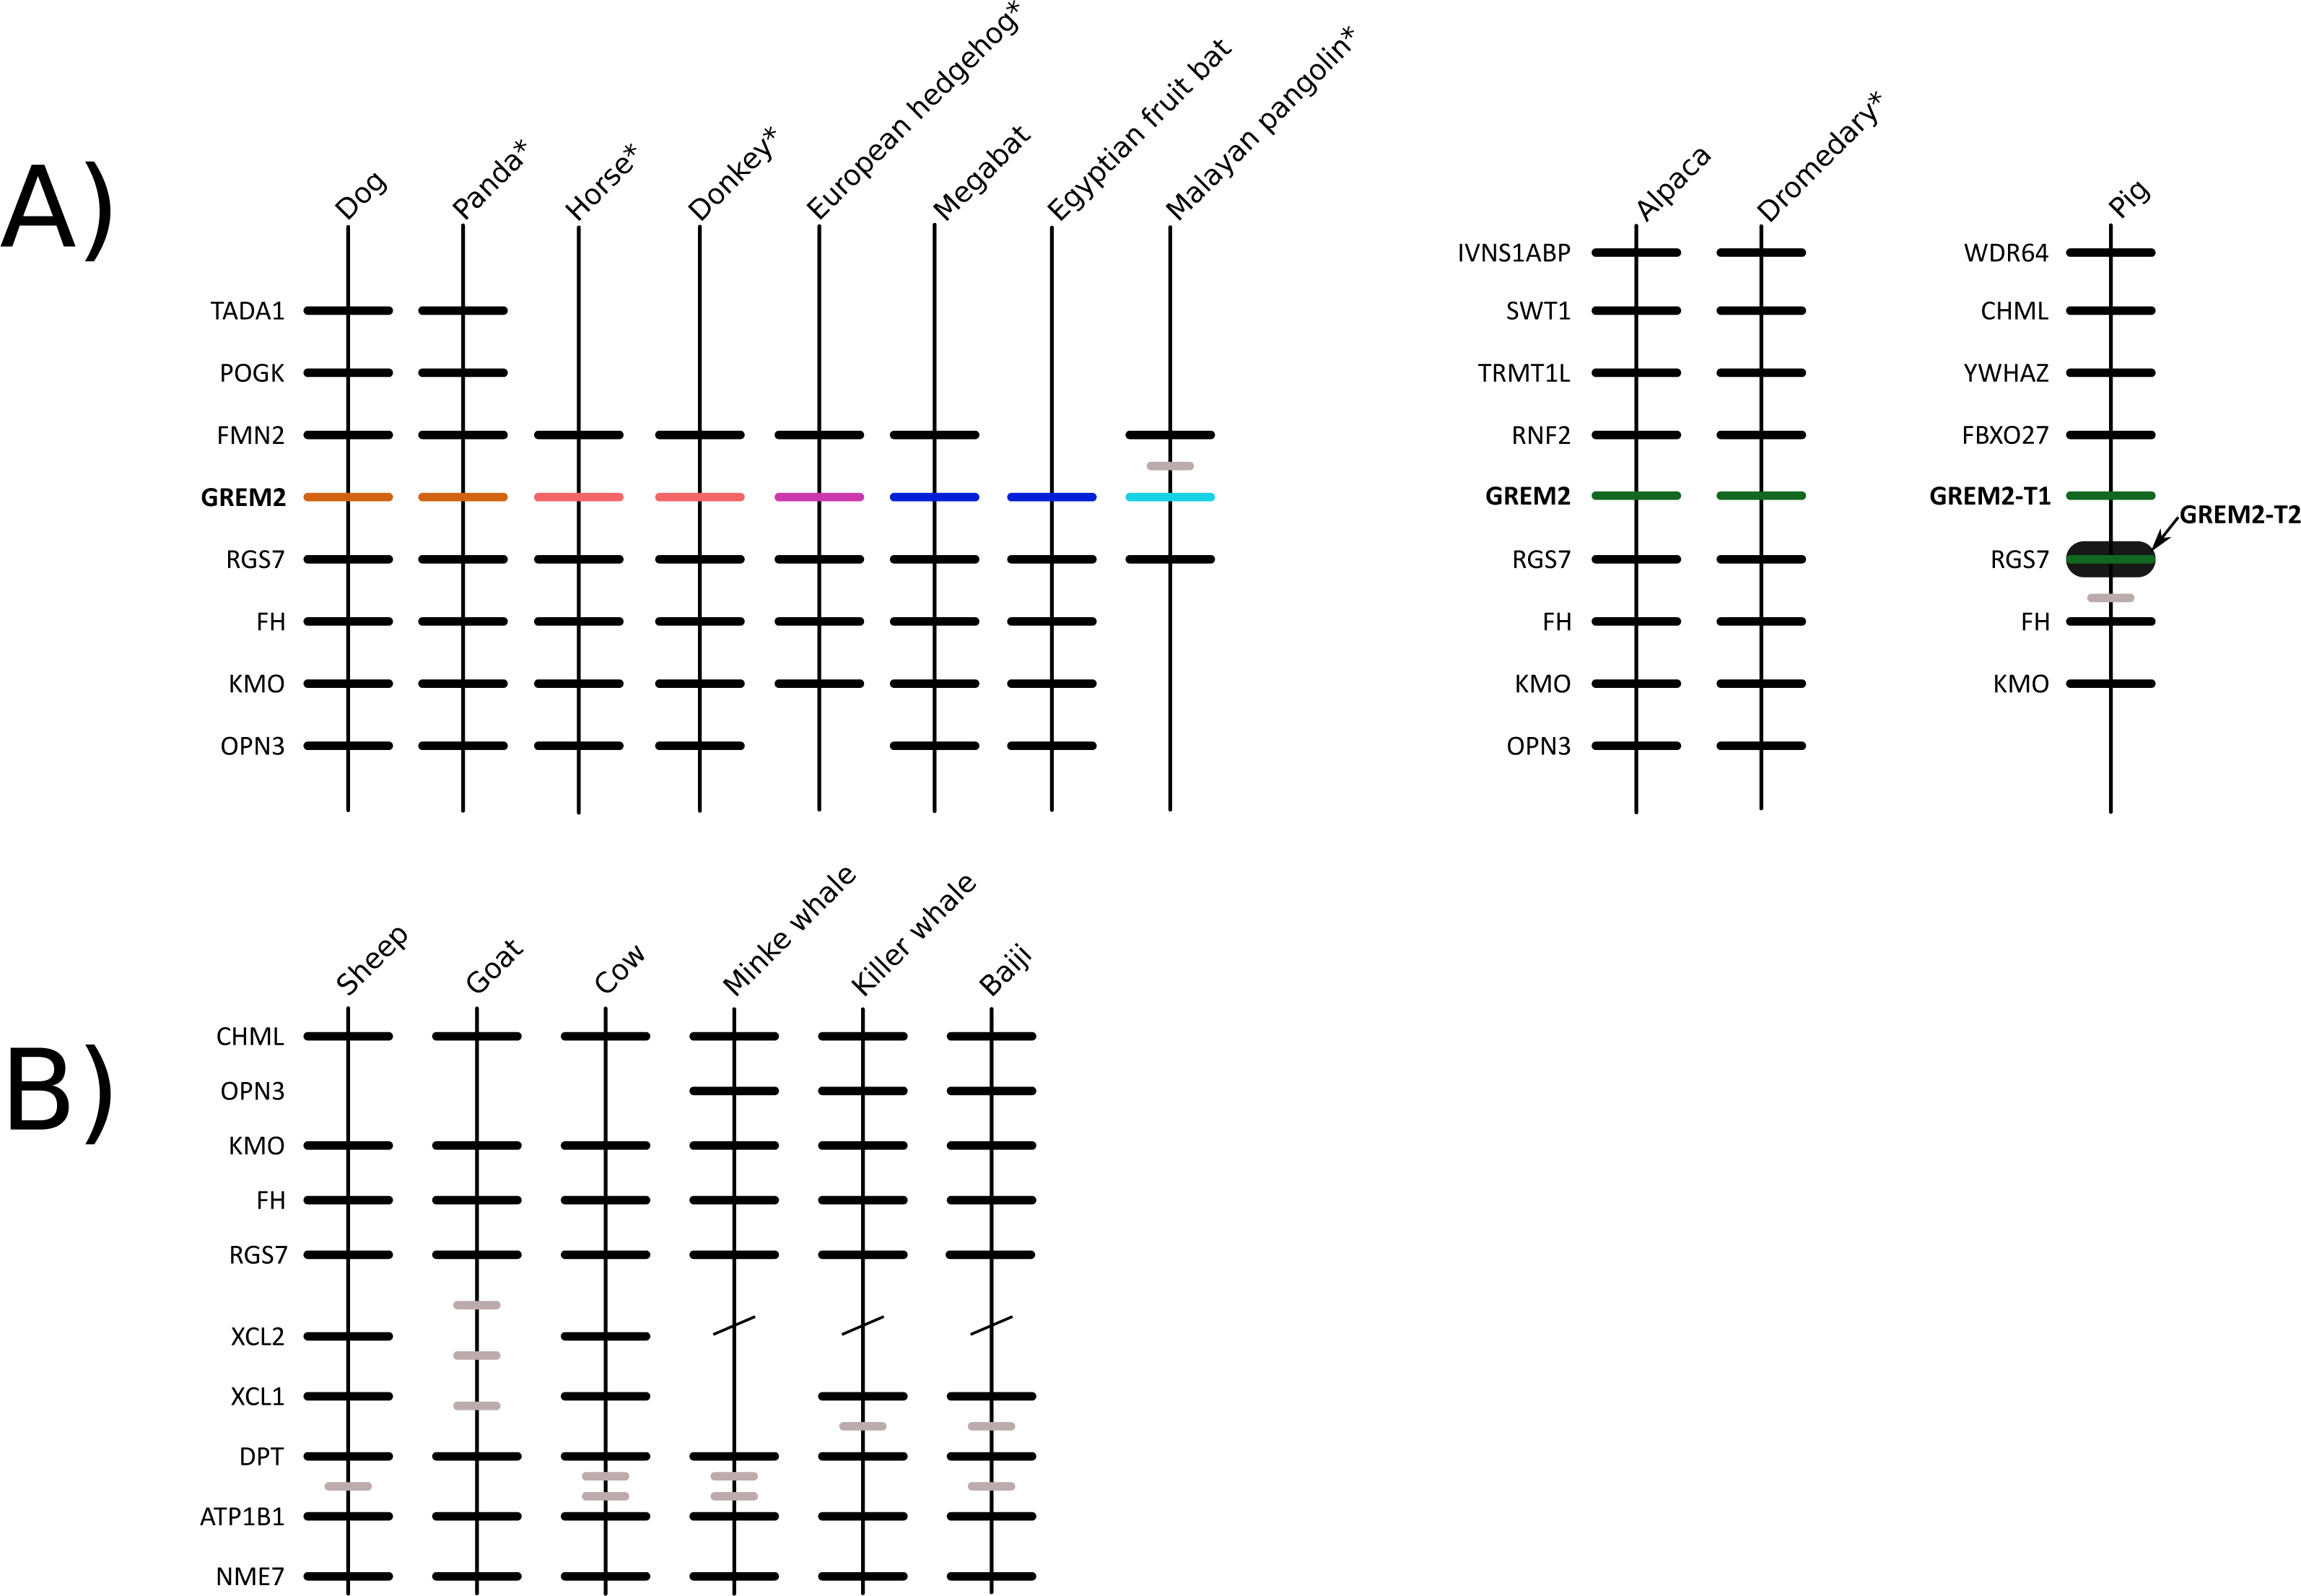 Grlin Timer Wiring Diagram Free Download Trusted Diagrams Amc Gremlin Evolution Of 2 In Cetartiodactyl Mammals Gene Loss Ford Full Size